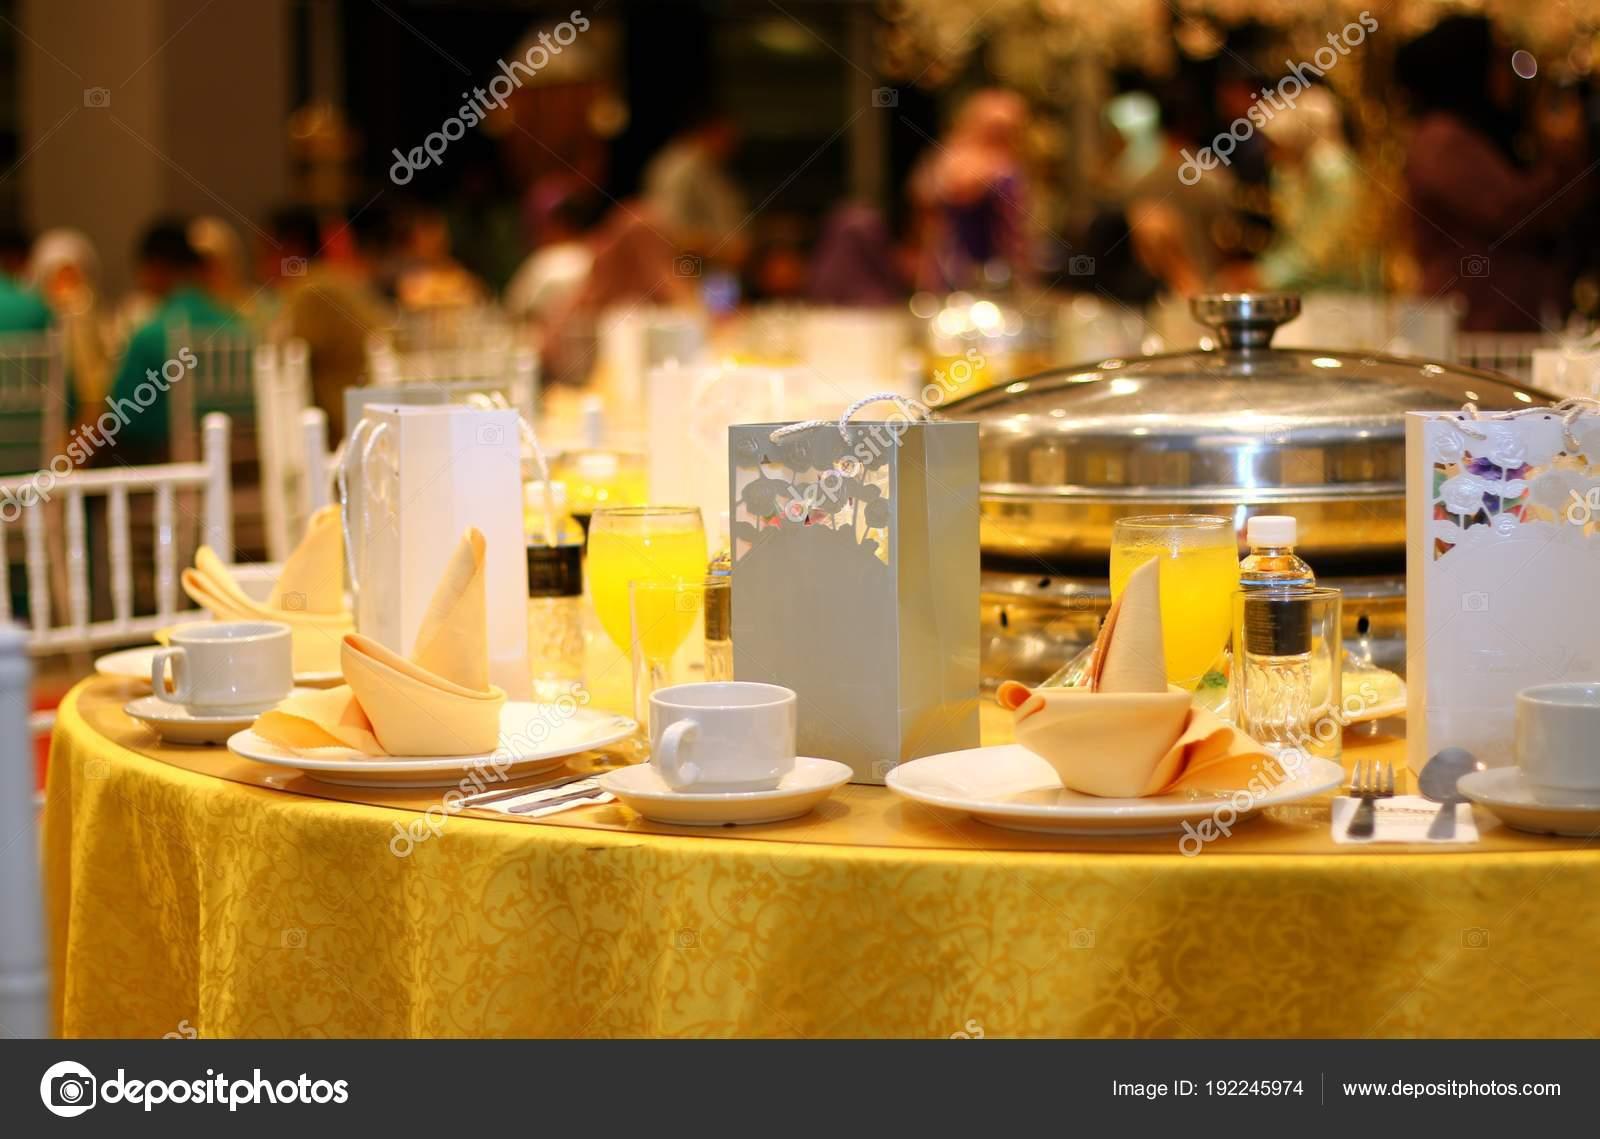 Ballroom table setting and arrangement \u2014 Photo by razihusin & Ballroom Table Setting Arrangement \u2014 Stock Photo © razihusin #192245974